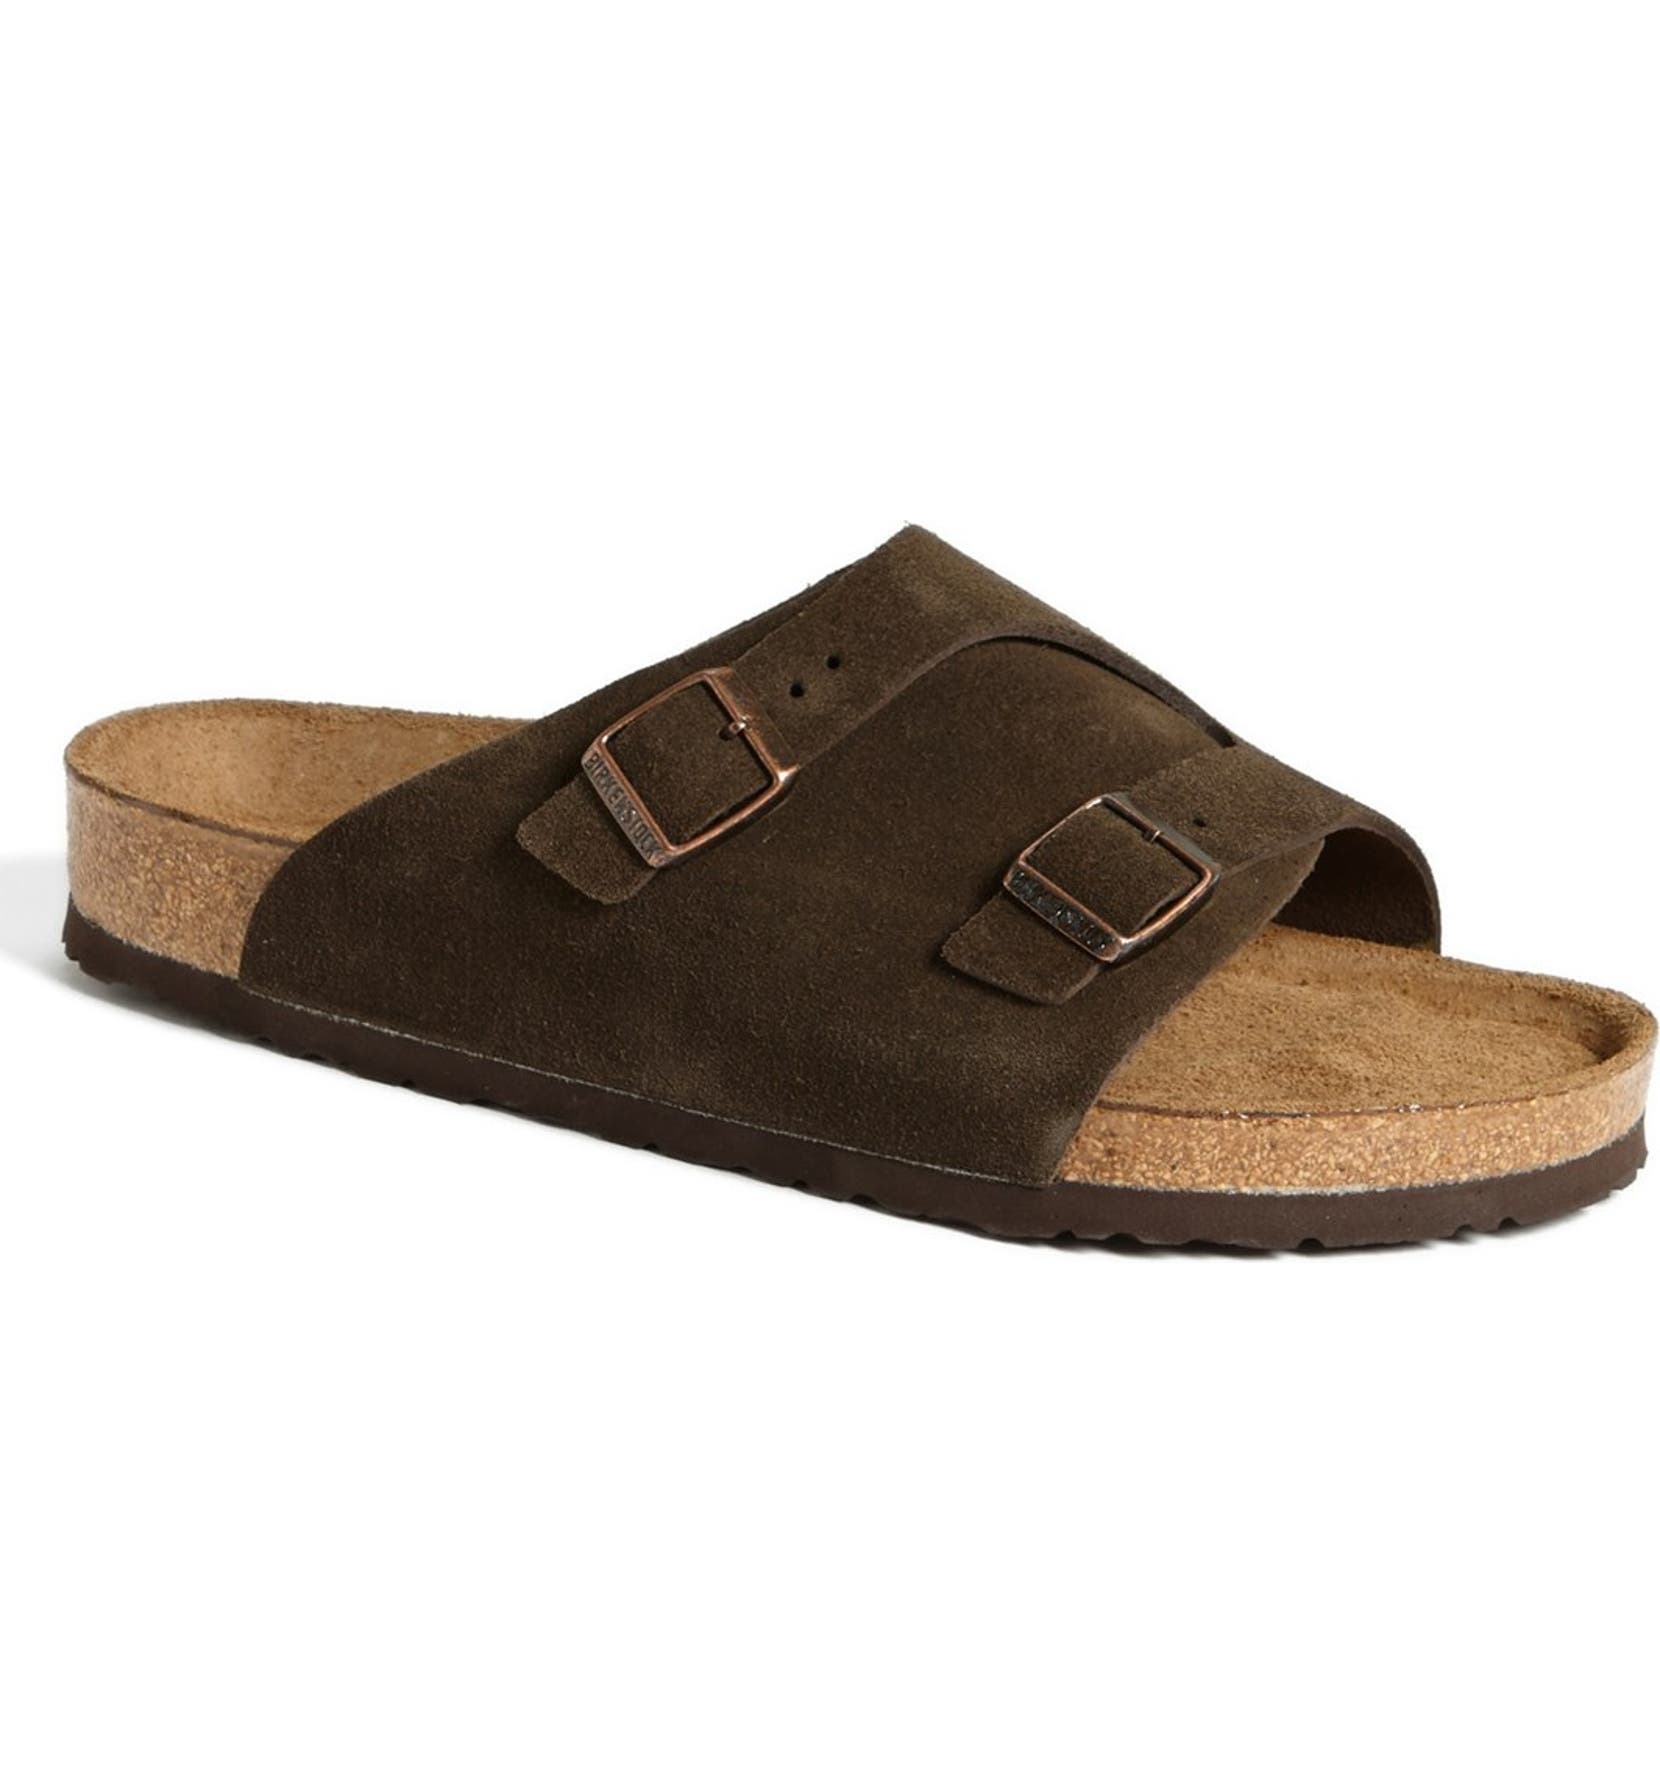 957c28cb8216 Birkenstock  Zürich Soft  Sandal (Men)